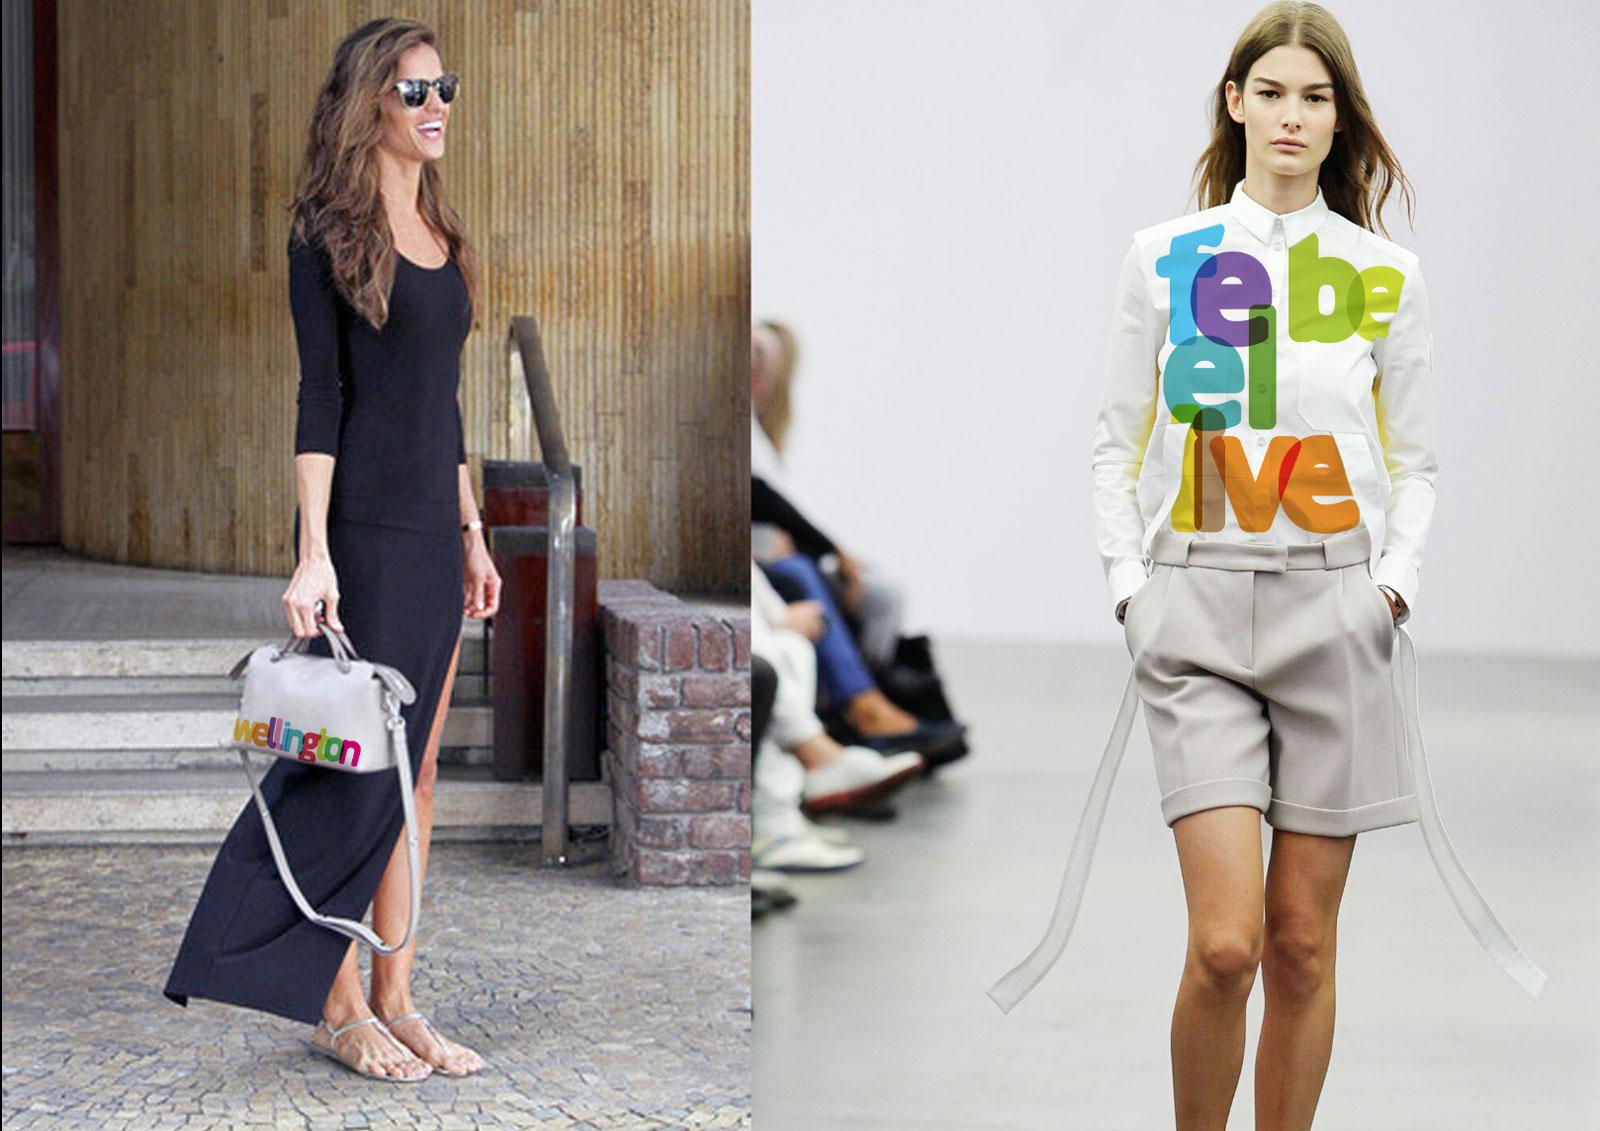 wellington fashion portofoliu inoveo